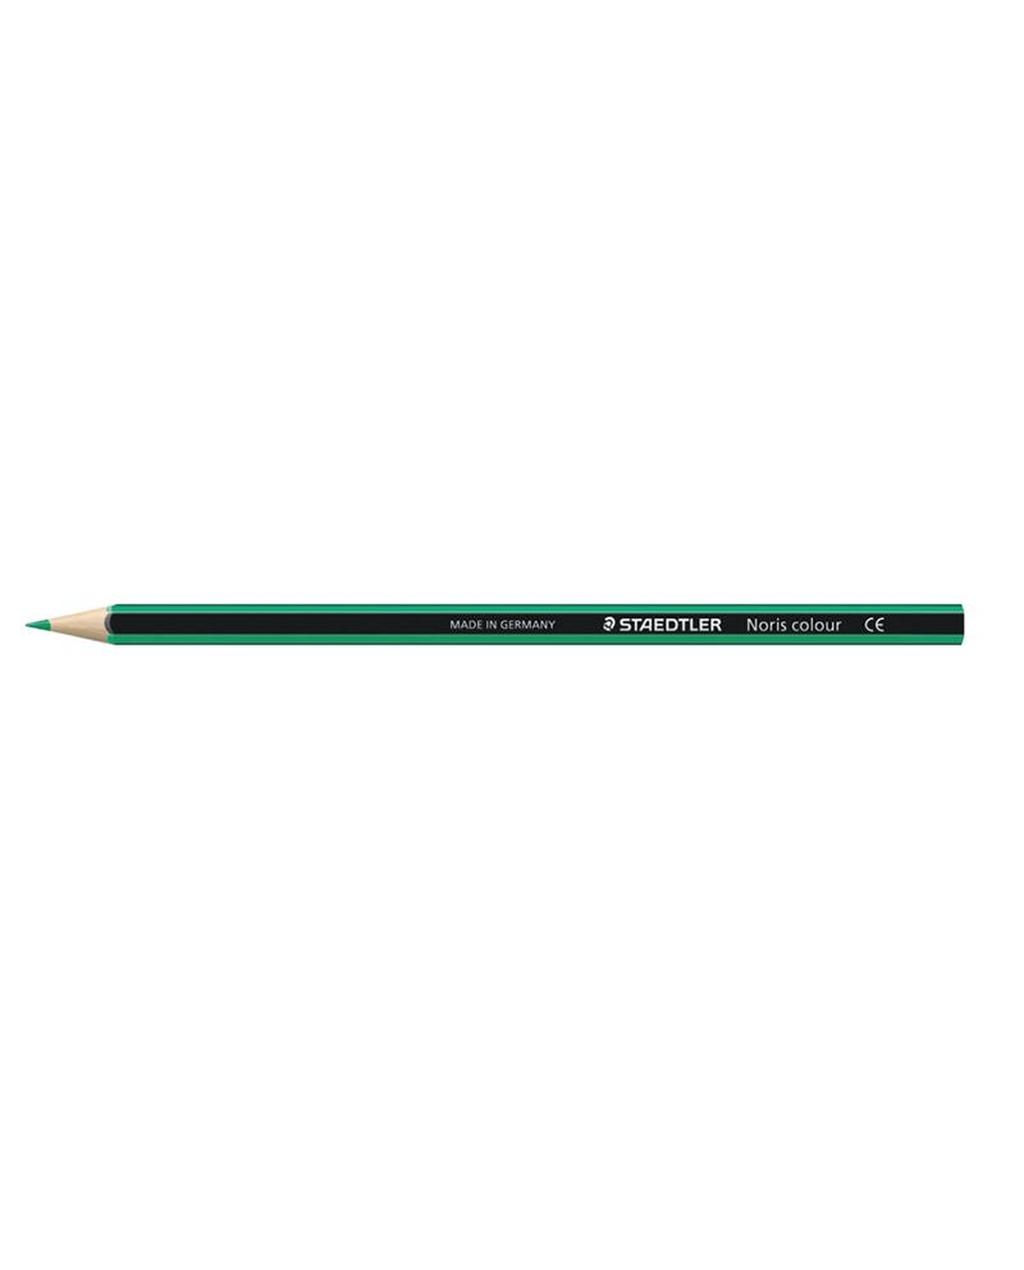 Staedtler Noris Colour Colouring Pencils - Green